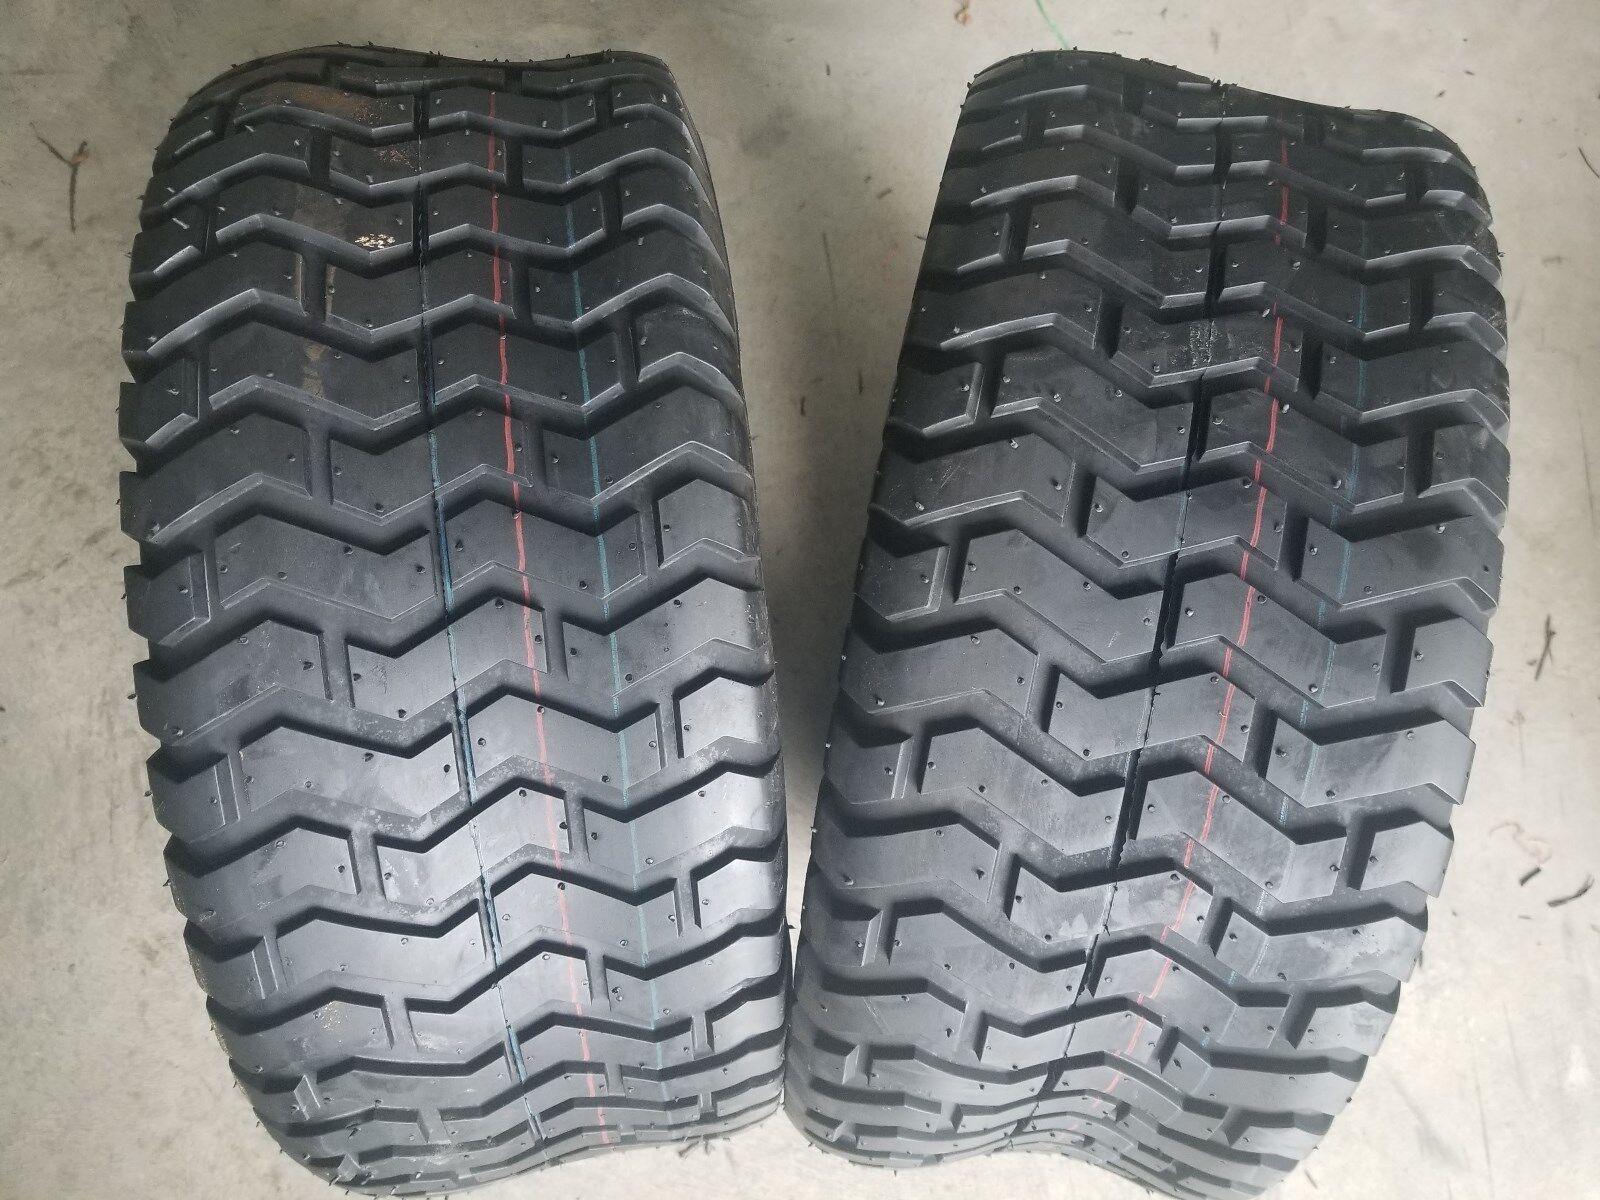 2 - 23 9.50-12 4 Ply Deestone D265 Turf Lawn Mower Tires PAIR DS7081 23 9.5-12